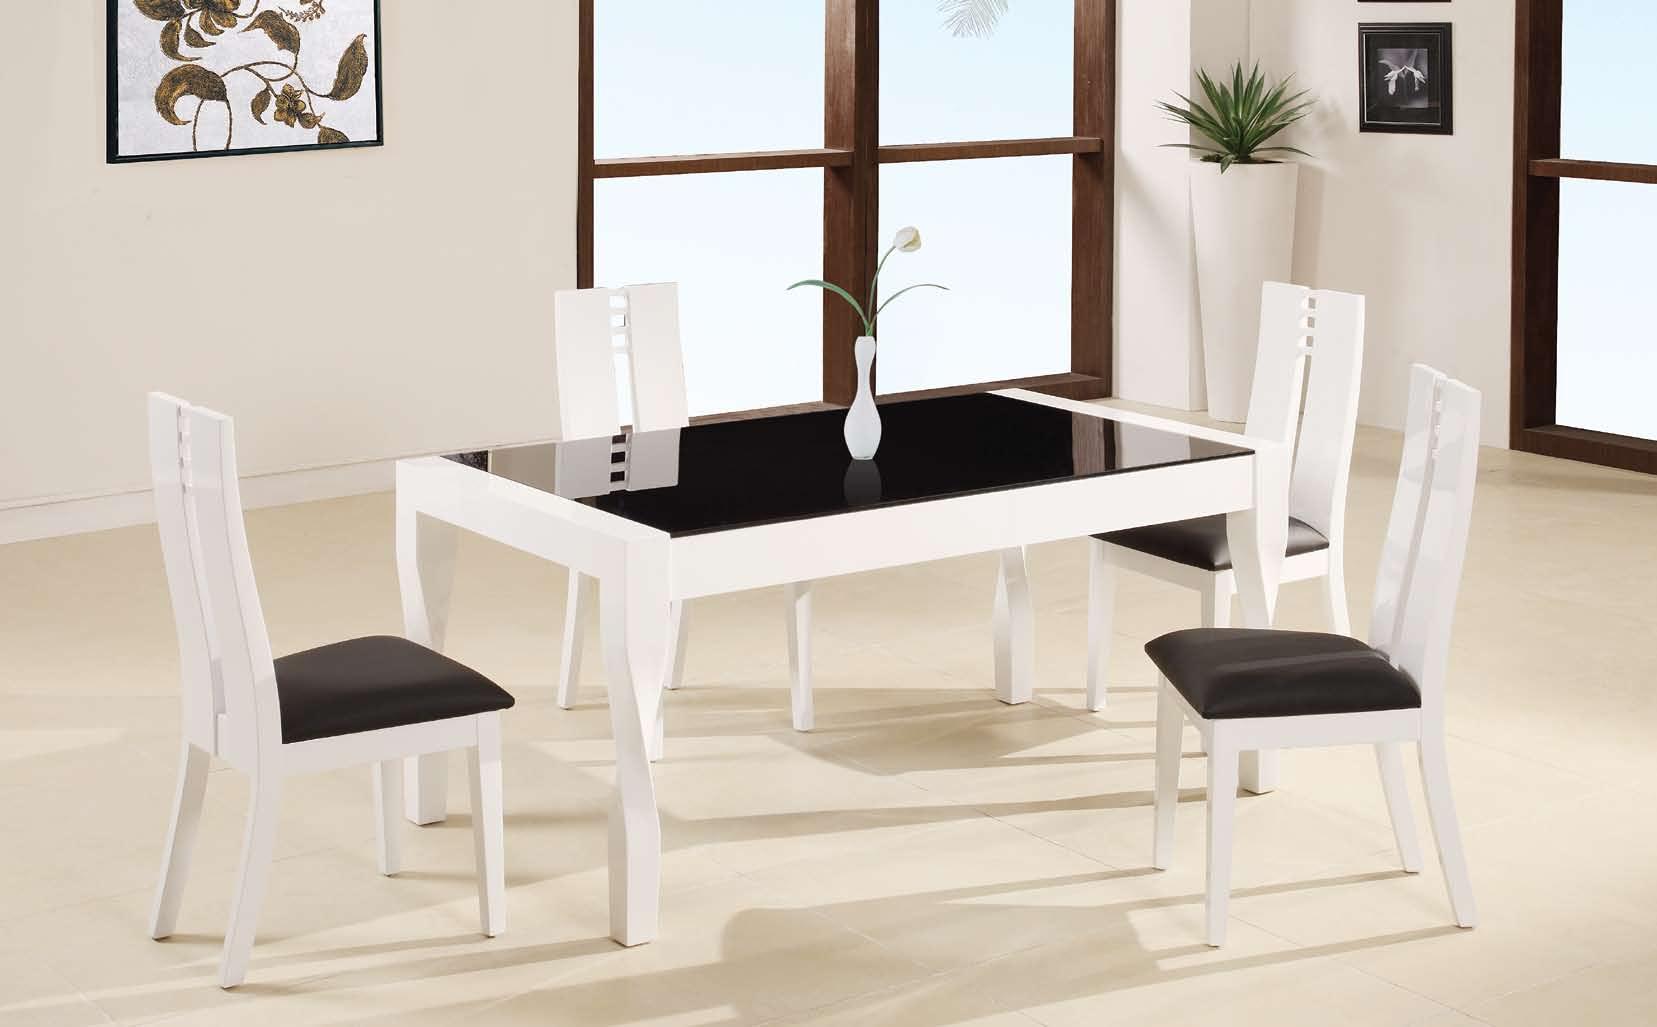 Cheap Global Furniture USA GF-822 Dining Set – Black/White